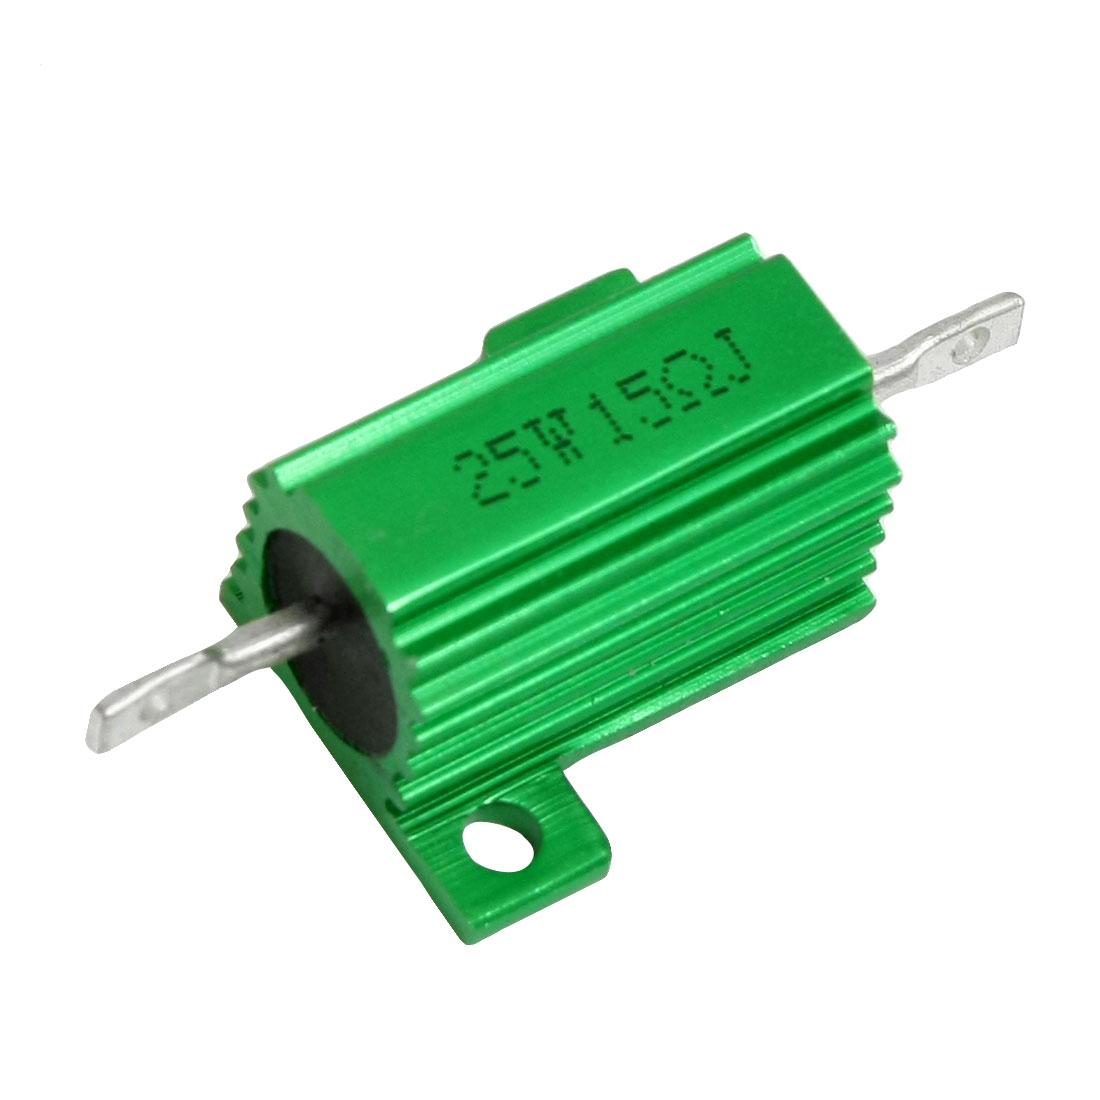 Green Aluminum Housed Clad Wirewound Resistor 5% 15 Ohm 25 Watt